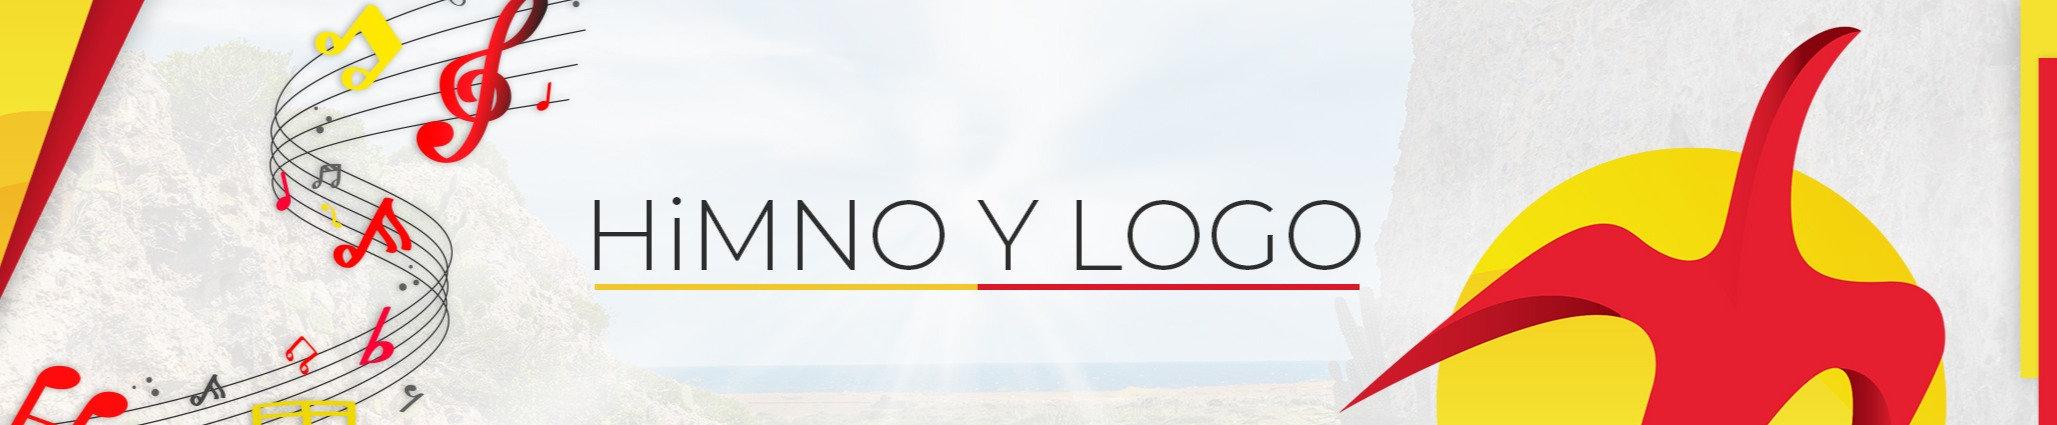 Himno-y-Logoss_edited.jpg